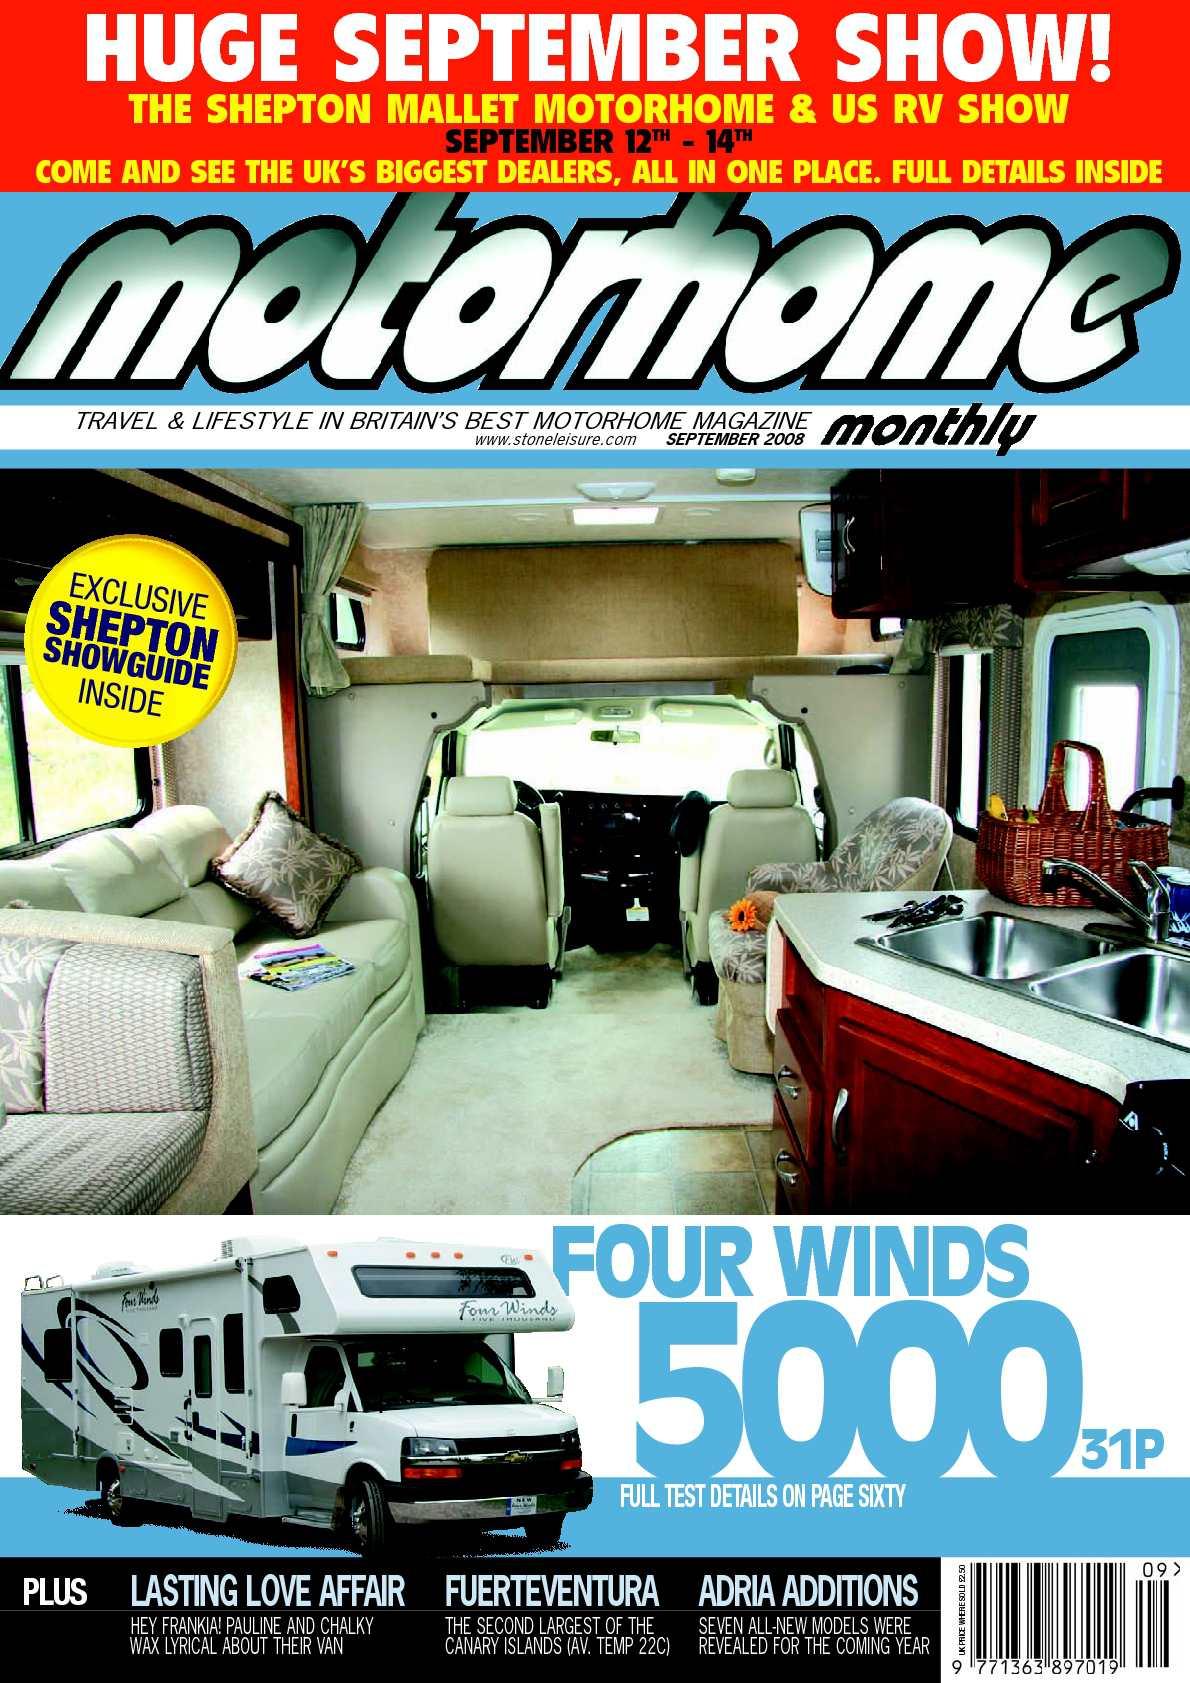 5d8eccf76d Calaméo - September 2008 - Motorhome Monthly Magazine